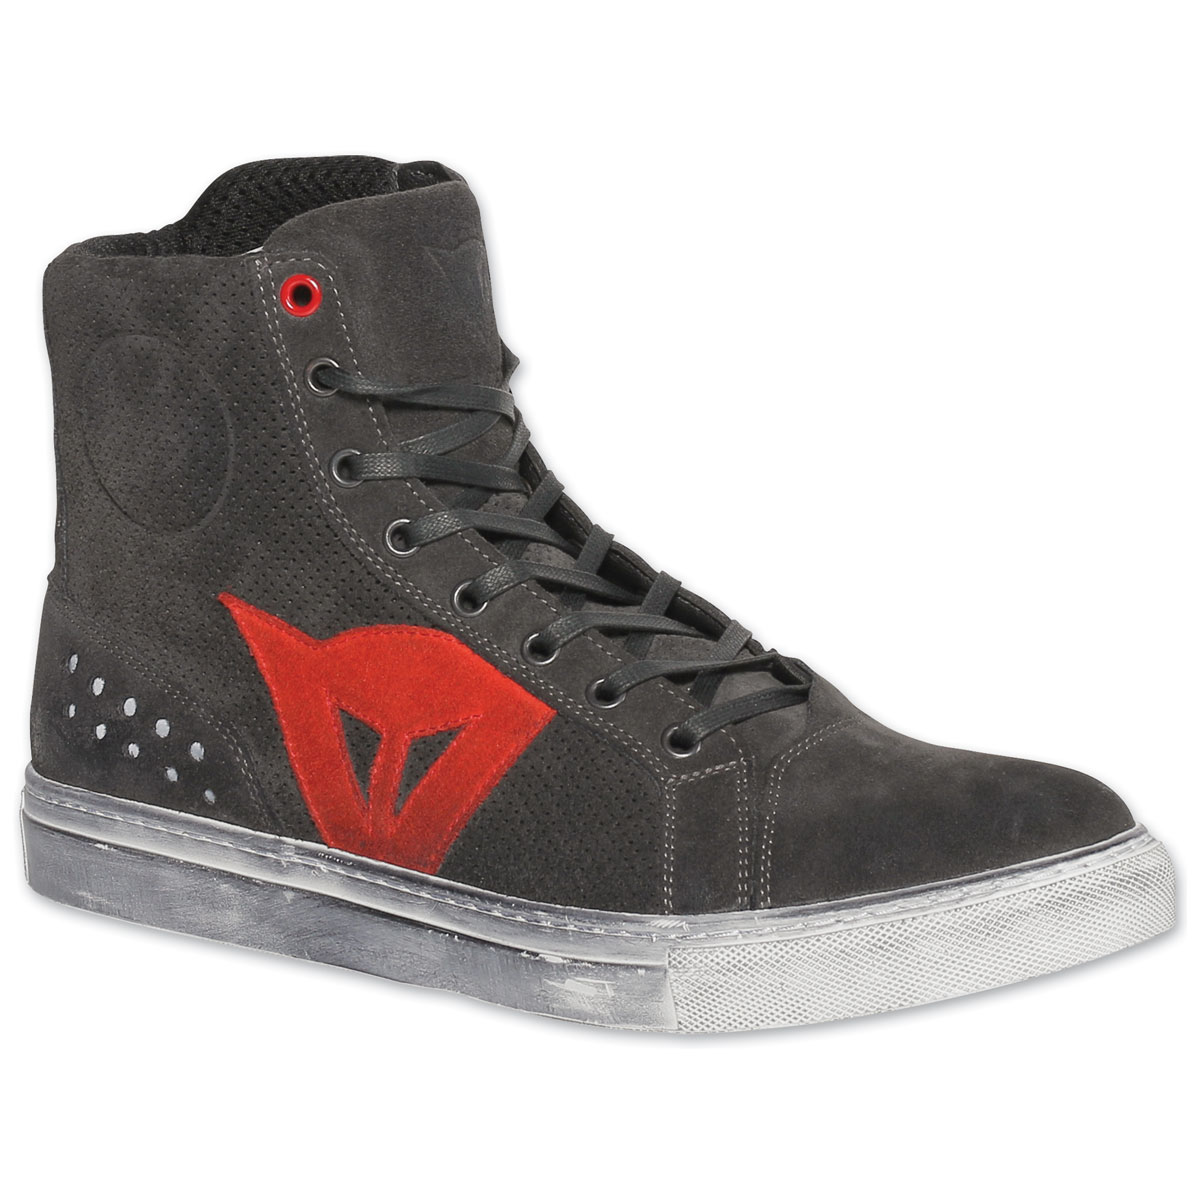 Dainese Men's Street Biker Air Carbon/Dark Red Shoes